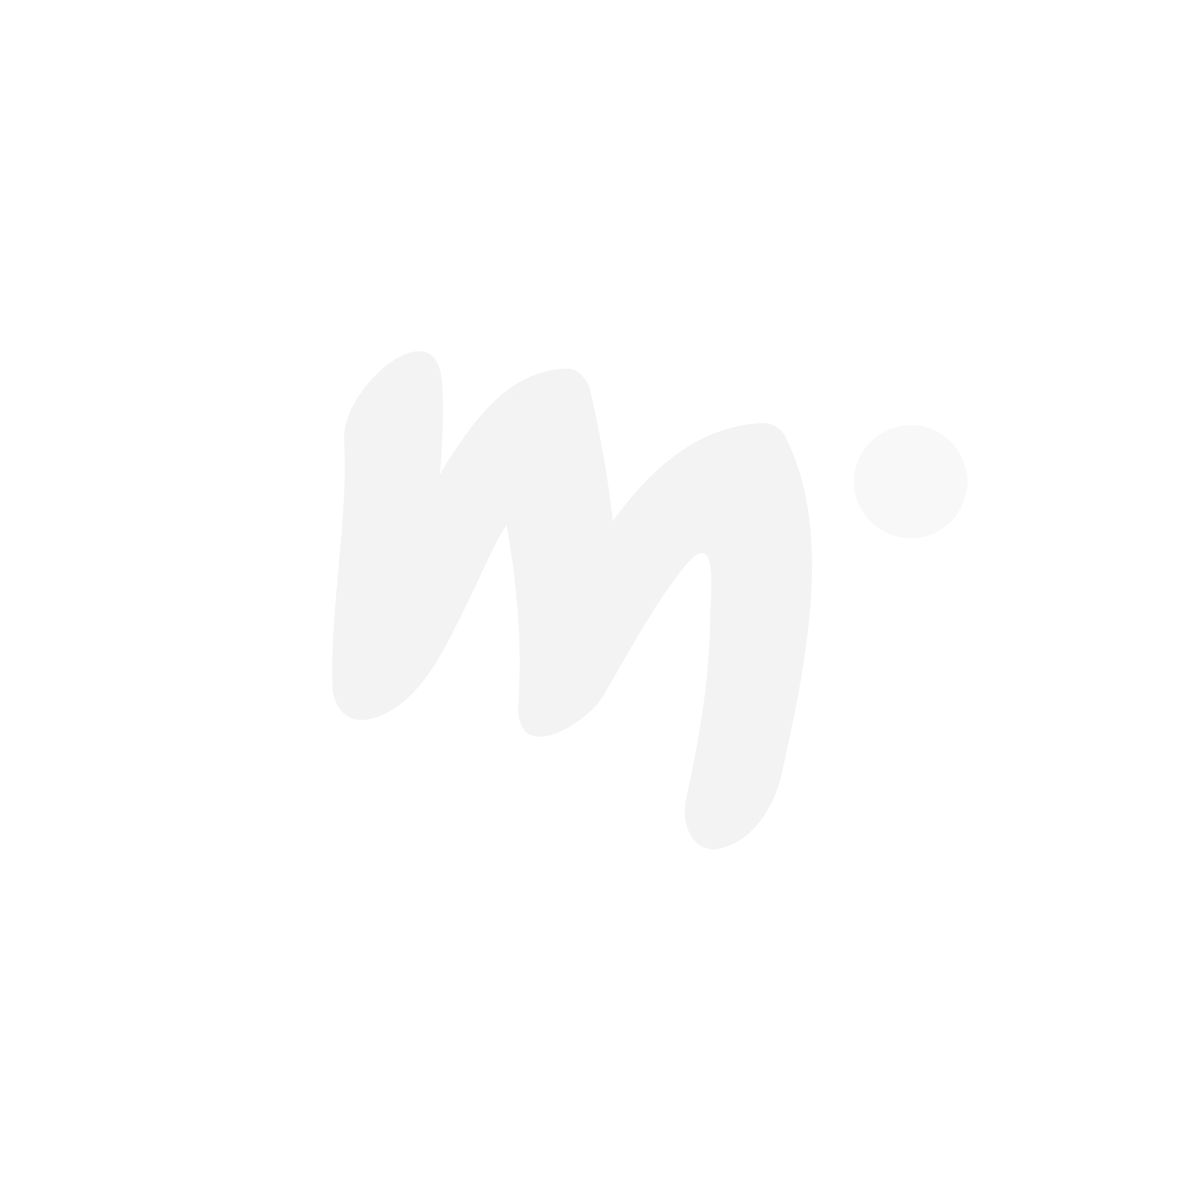 Peppi Pitkätossu Vahvin-uimahousut tummansininen